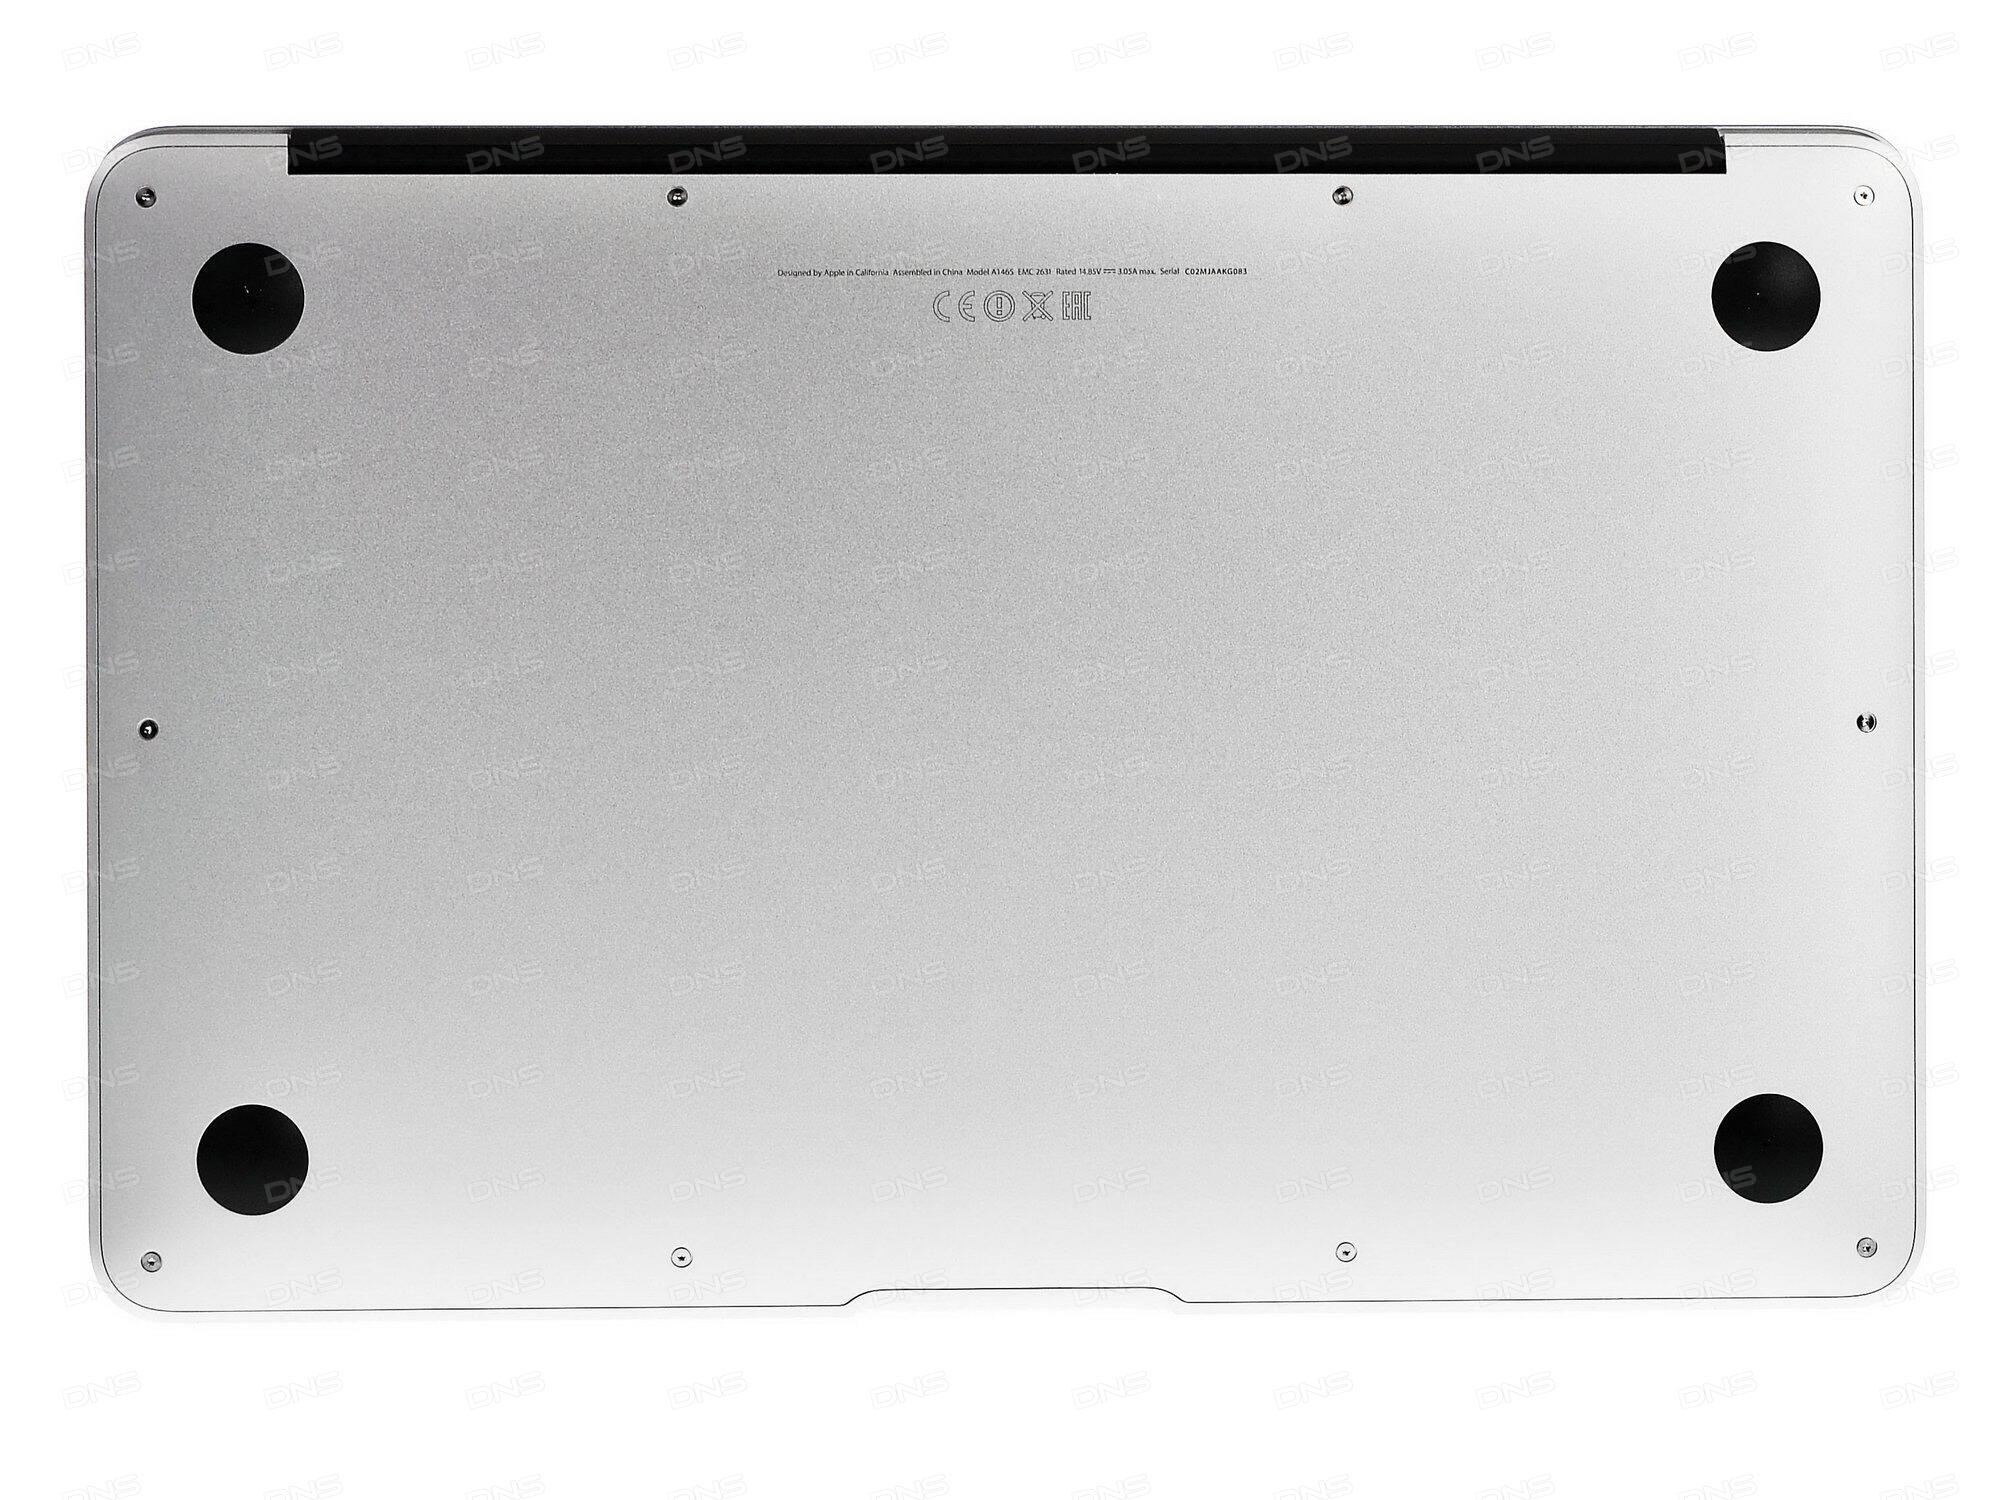 11 6 apple macbook air mjvp2ru a. Black Bedroom Furniture Sets. Home Design Ideas